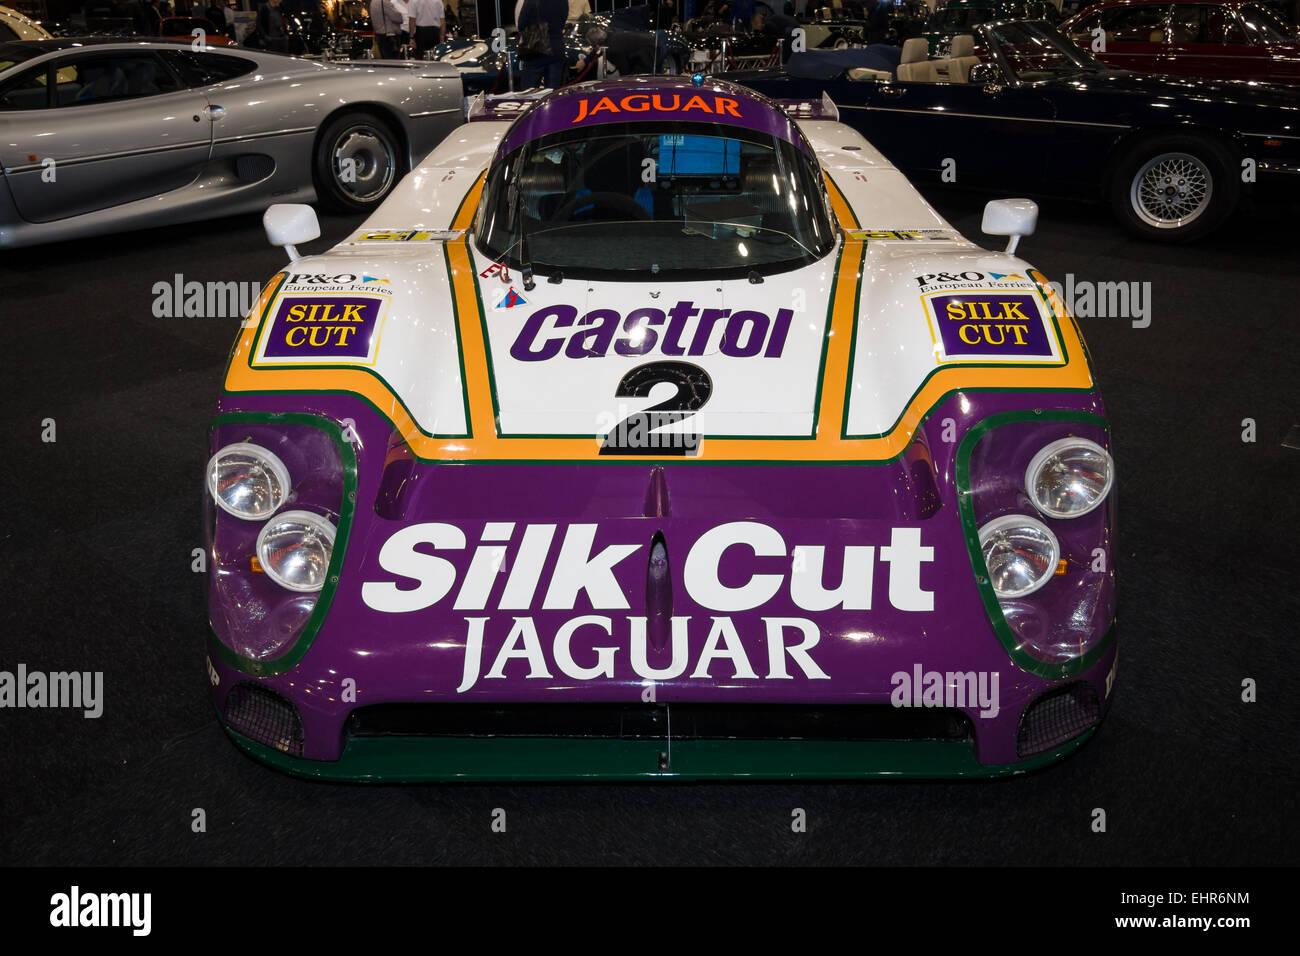 A sports-prototype race car Jaguar XJR-9. Team Silk Cut ...